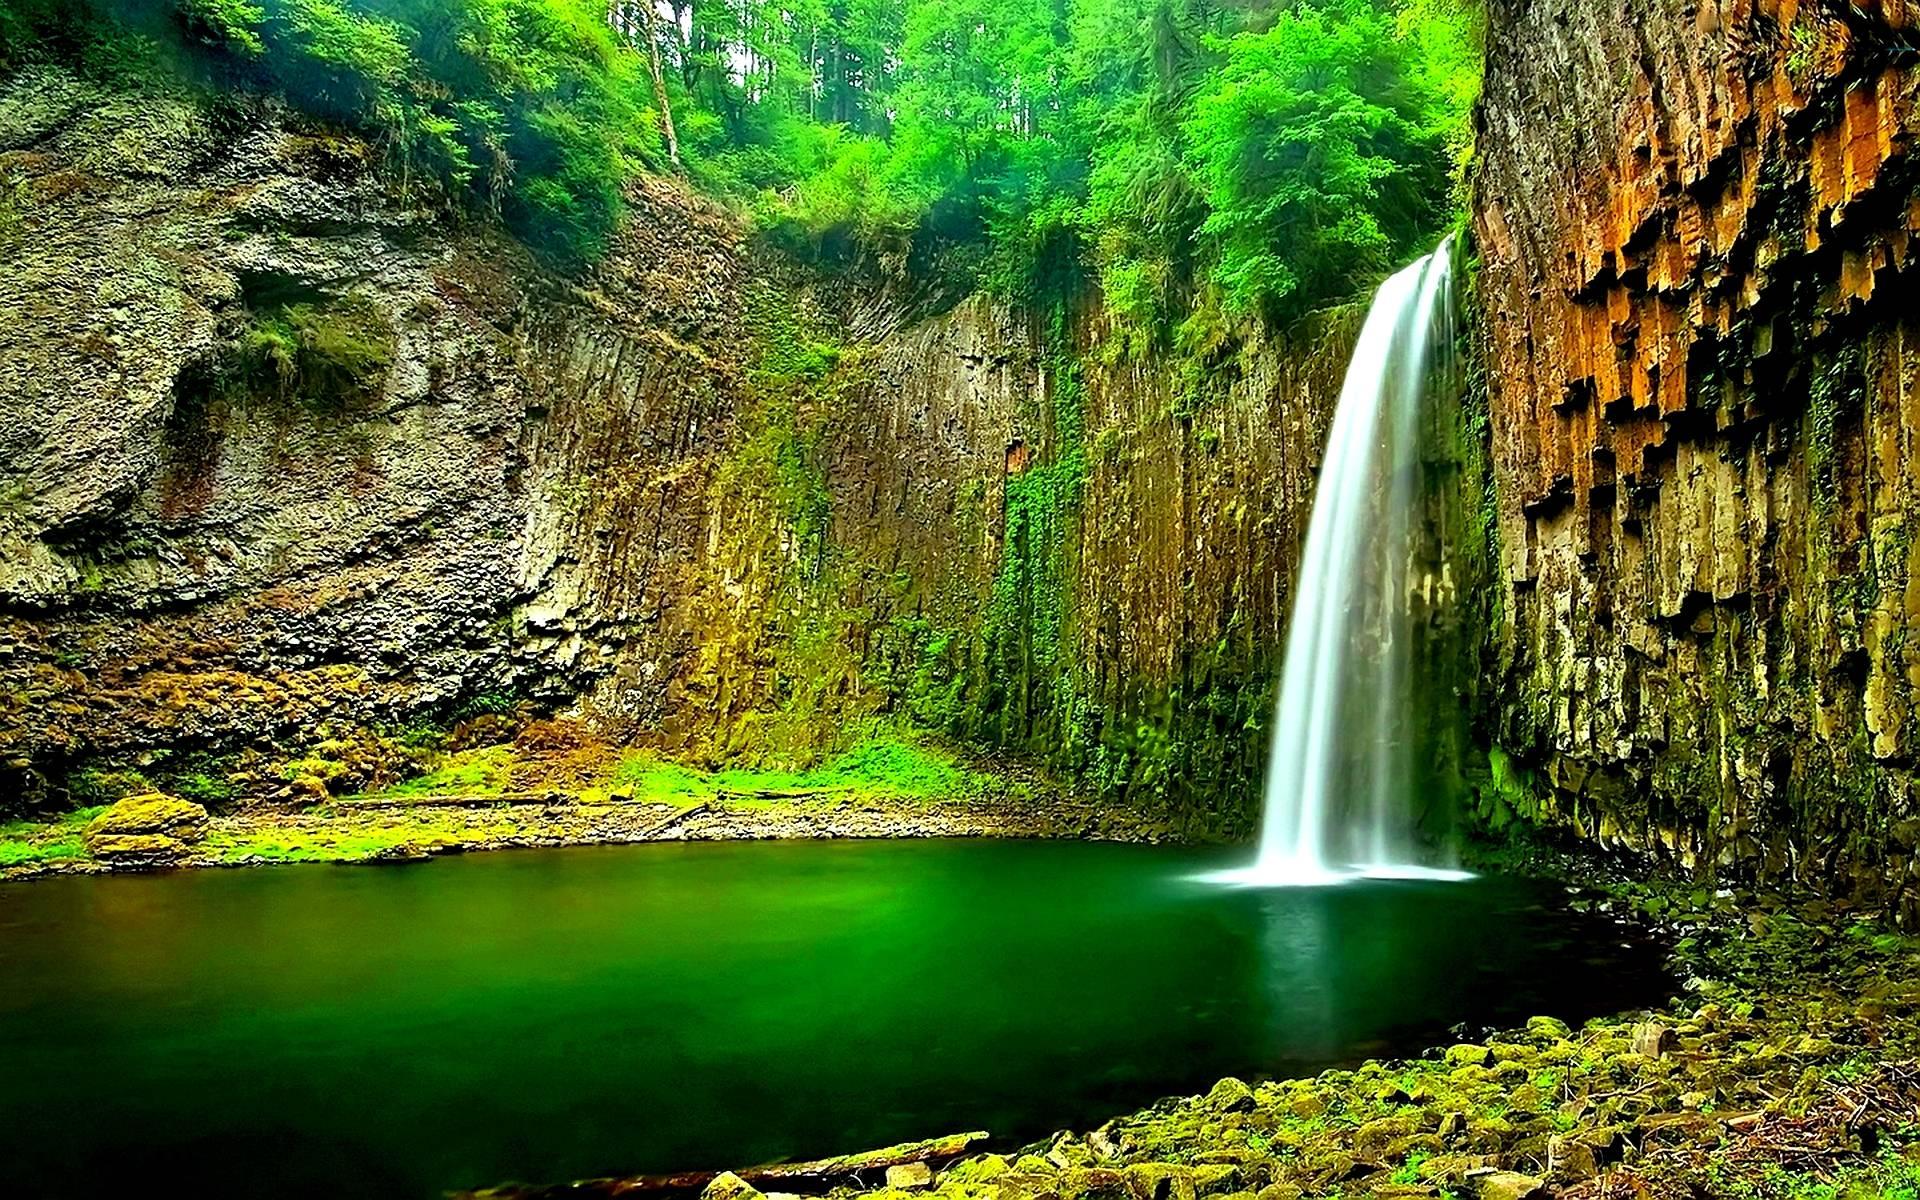 Jungle Waterfall Wallpaper Hd: Jungle Wallpapers